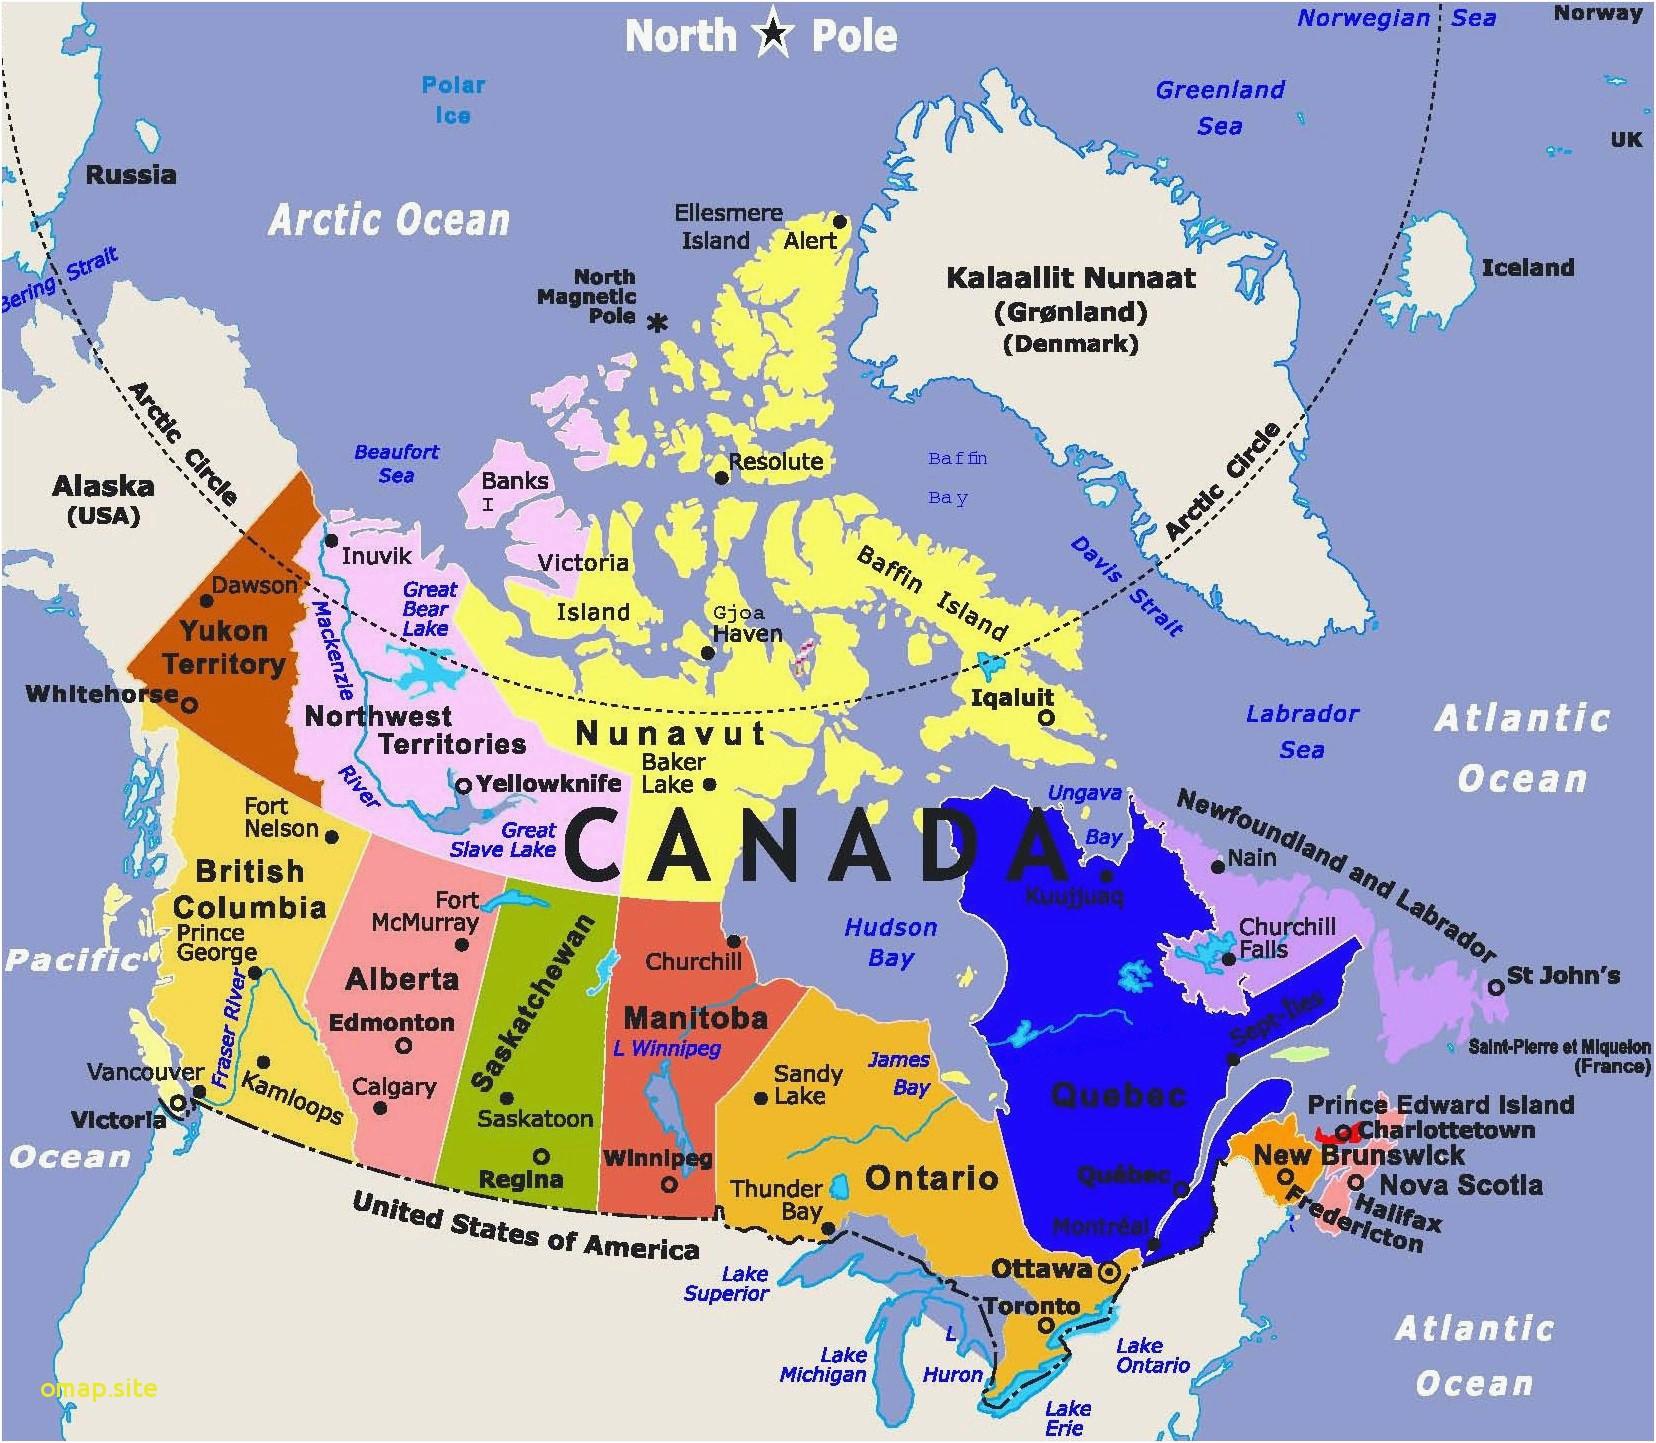 Calgary On Map Of Canada Hudson Ohio Map Hudson Bay On A Map Ungava Bay Canada Map